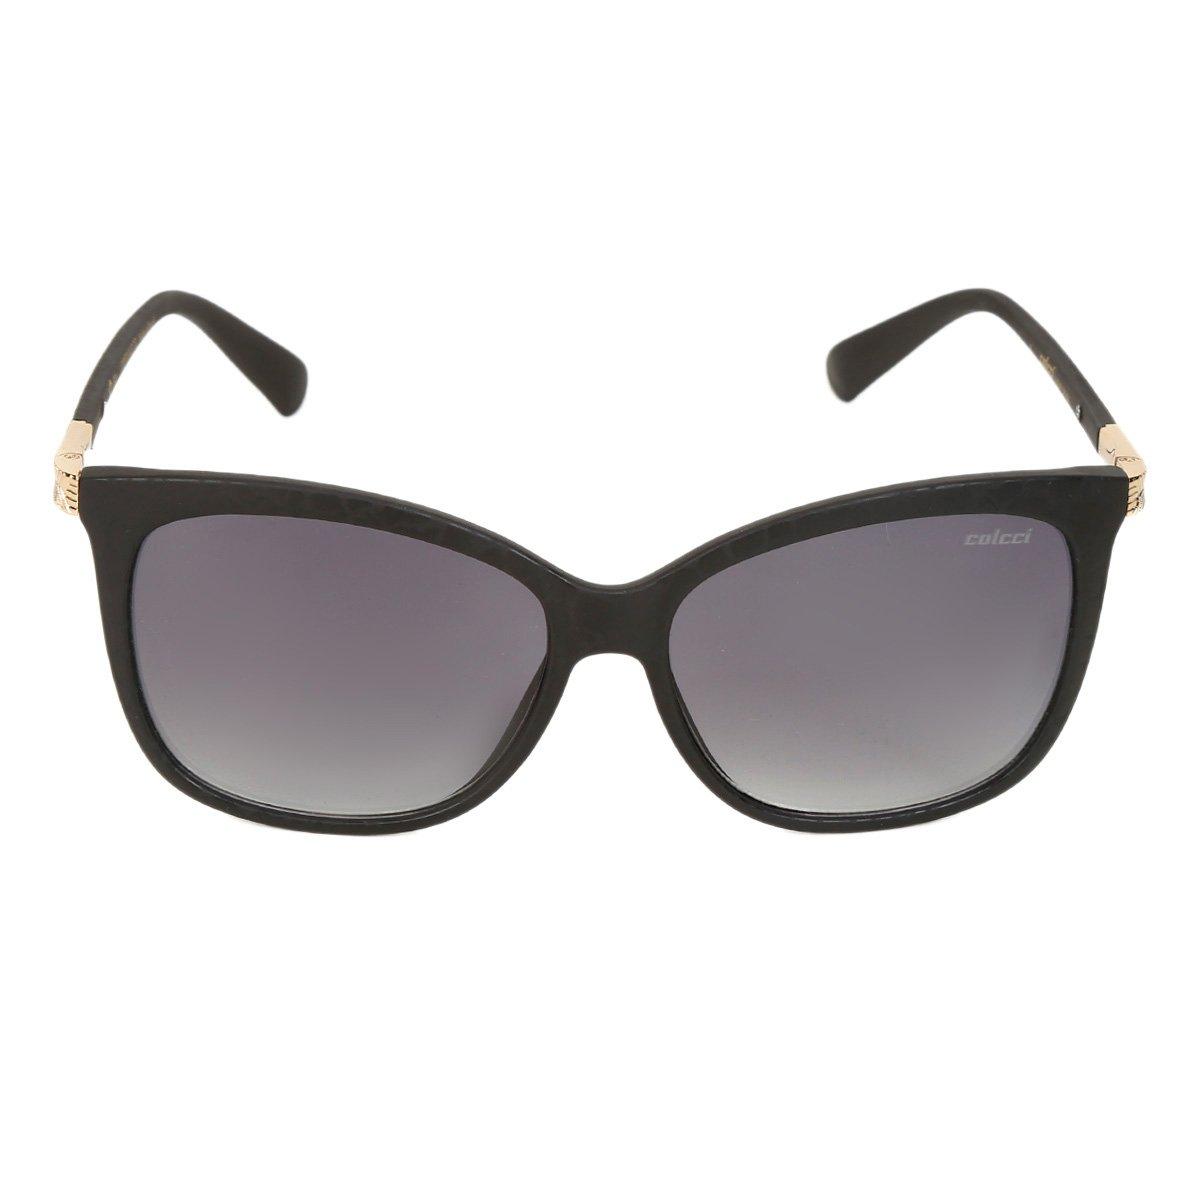 Óculos de Sol Colcci Ella Feminino - Compre Agora   Zattini 668c9ea0ca